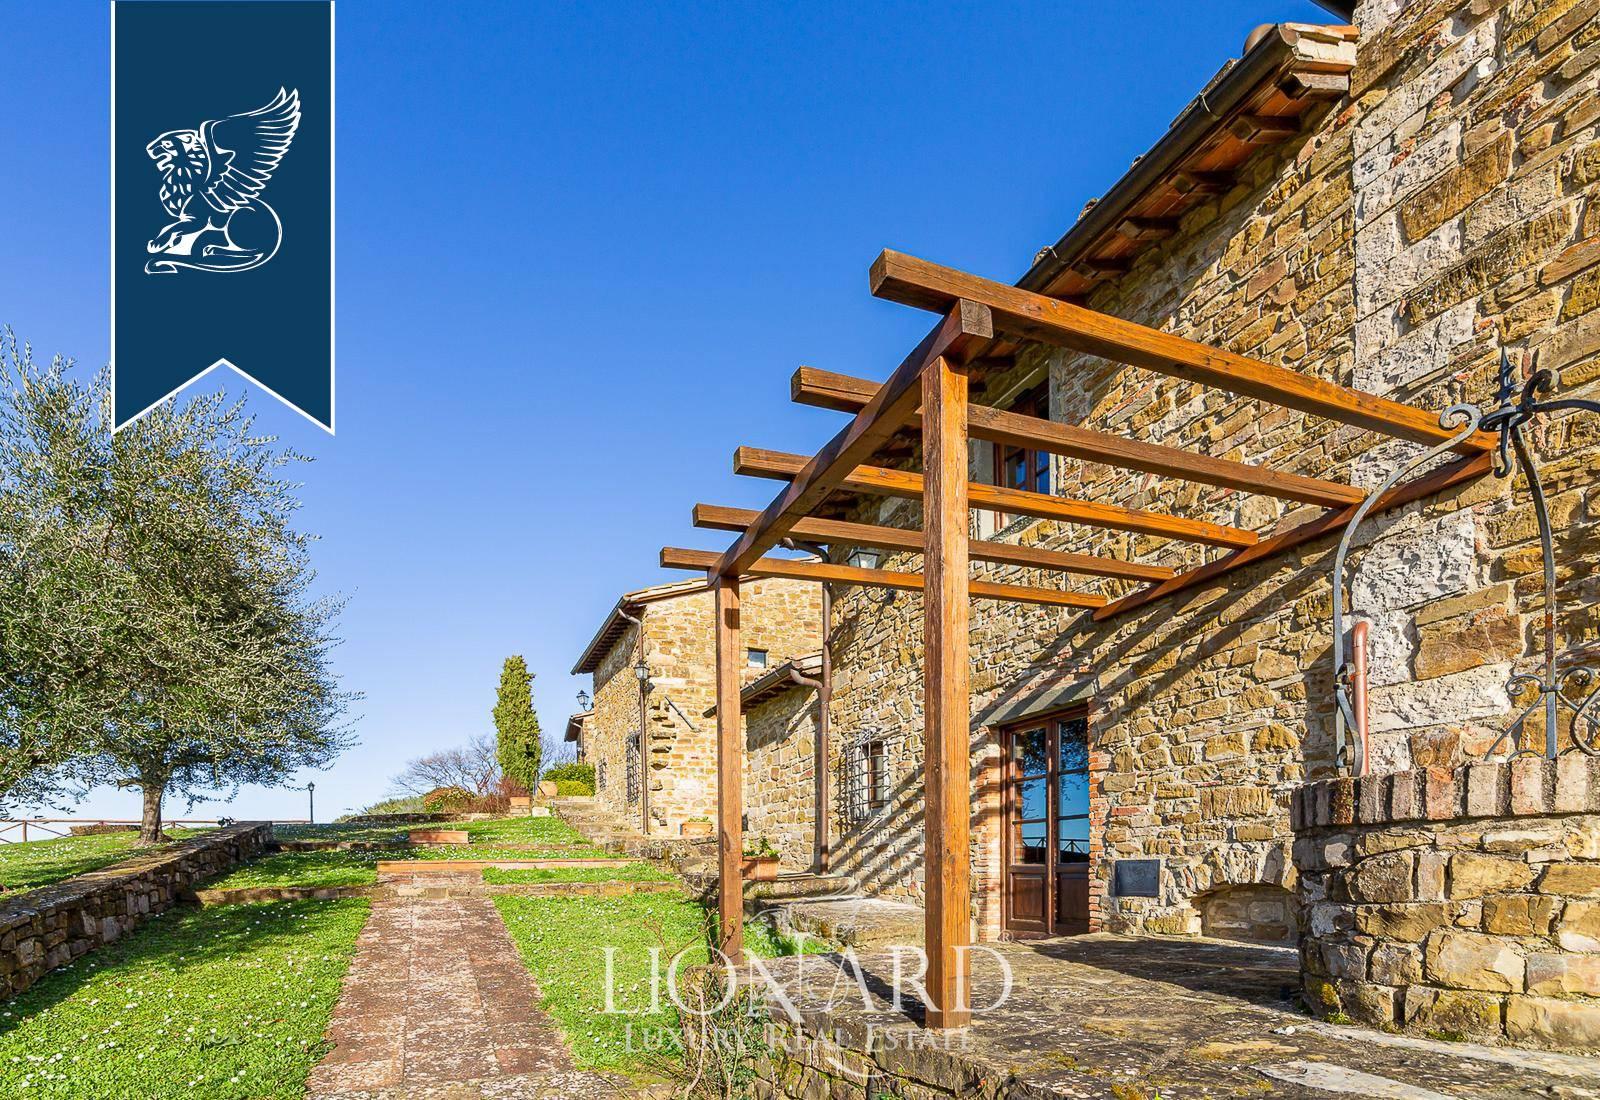 Villa in Vendita a Greve In Chianti: 0 locali, 400 mq - Foto 6